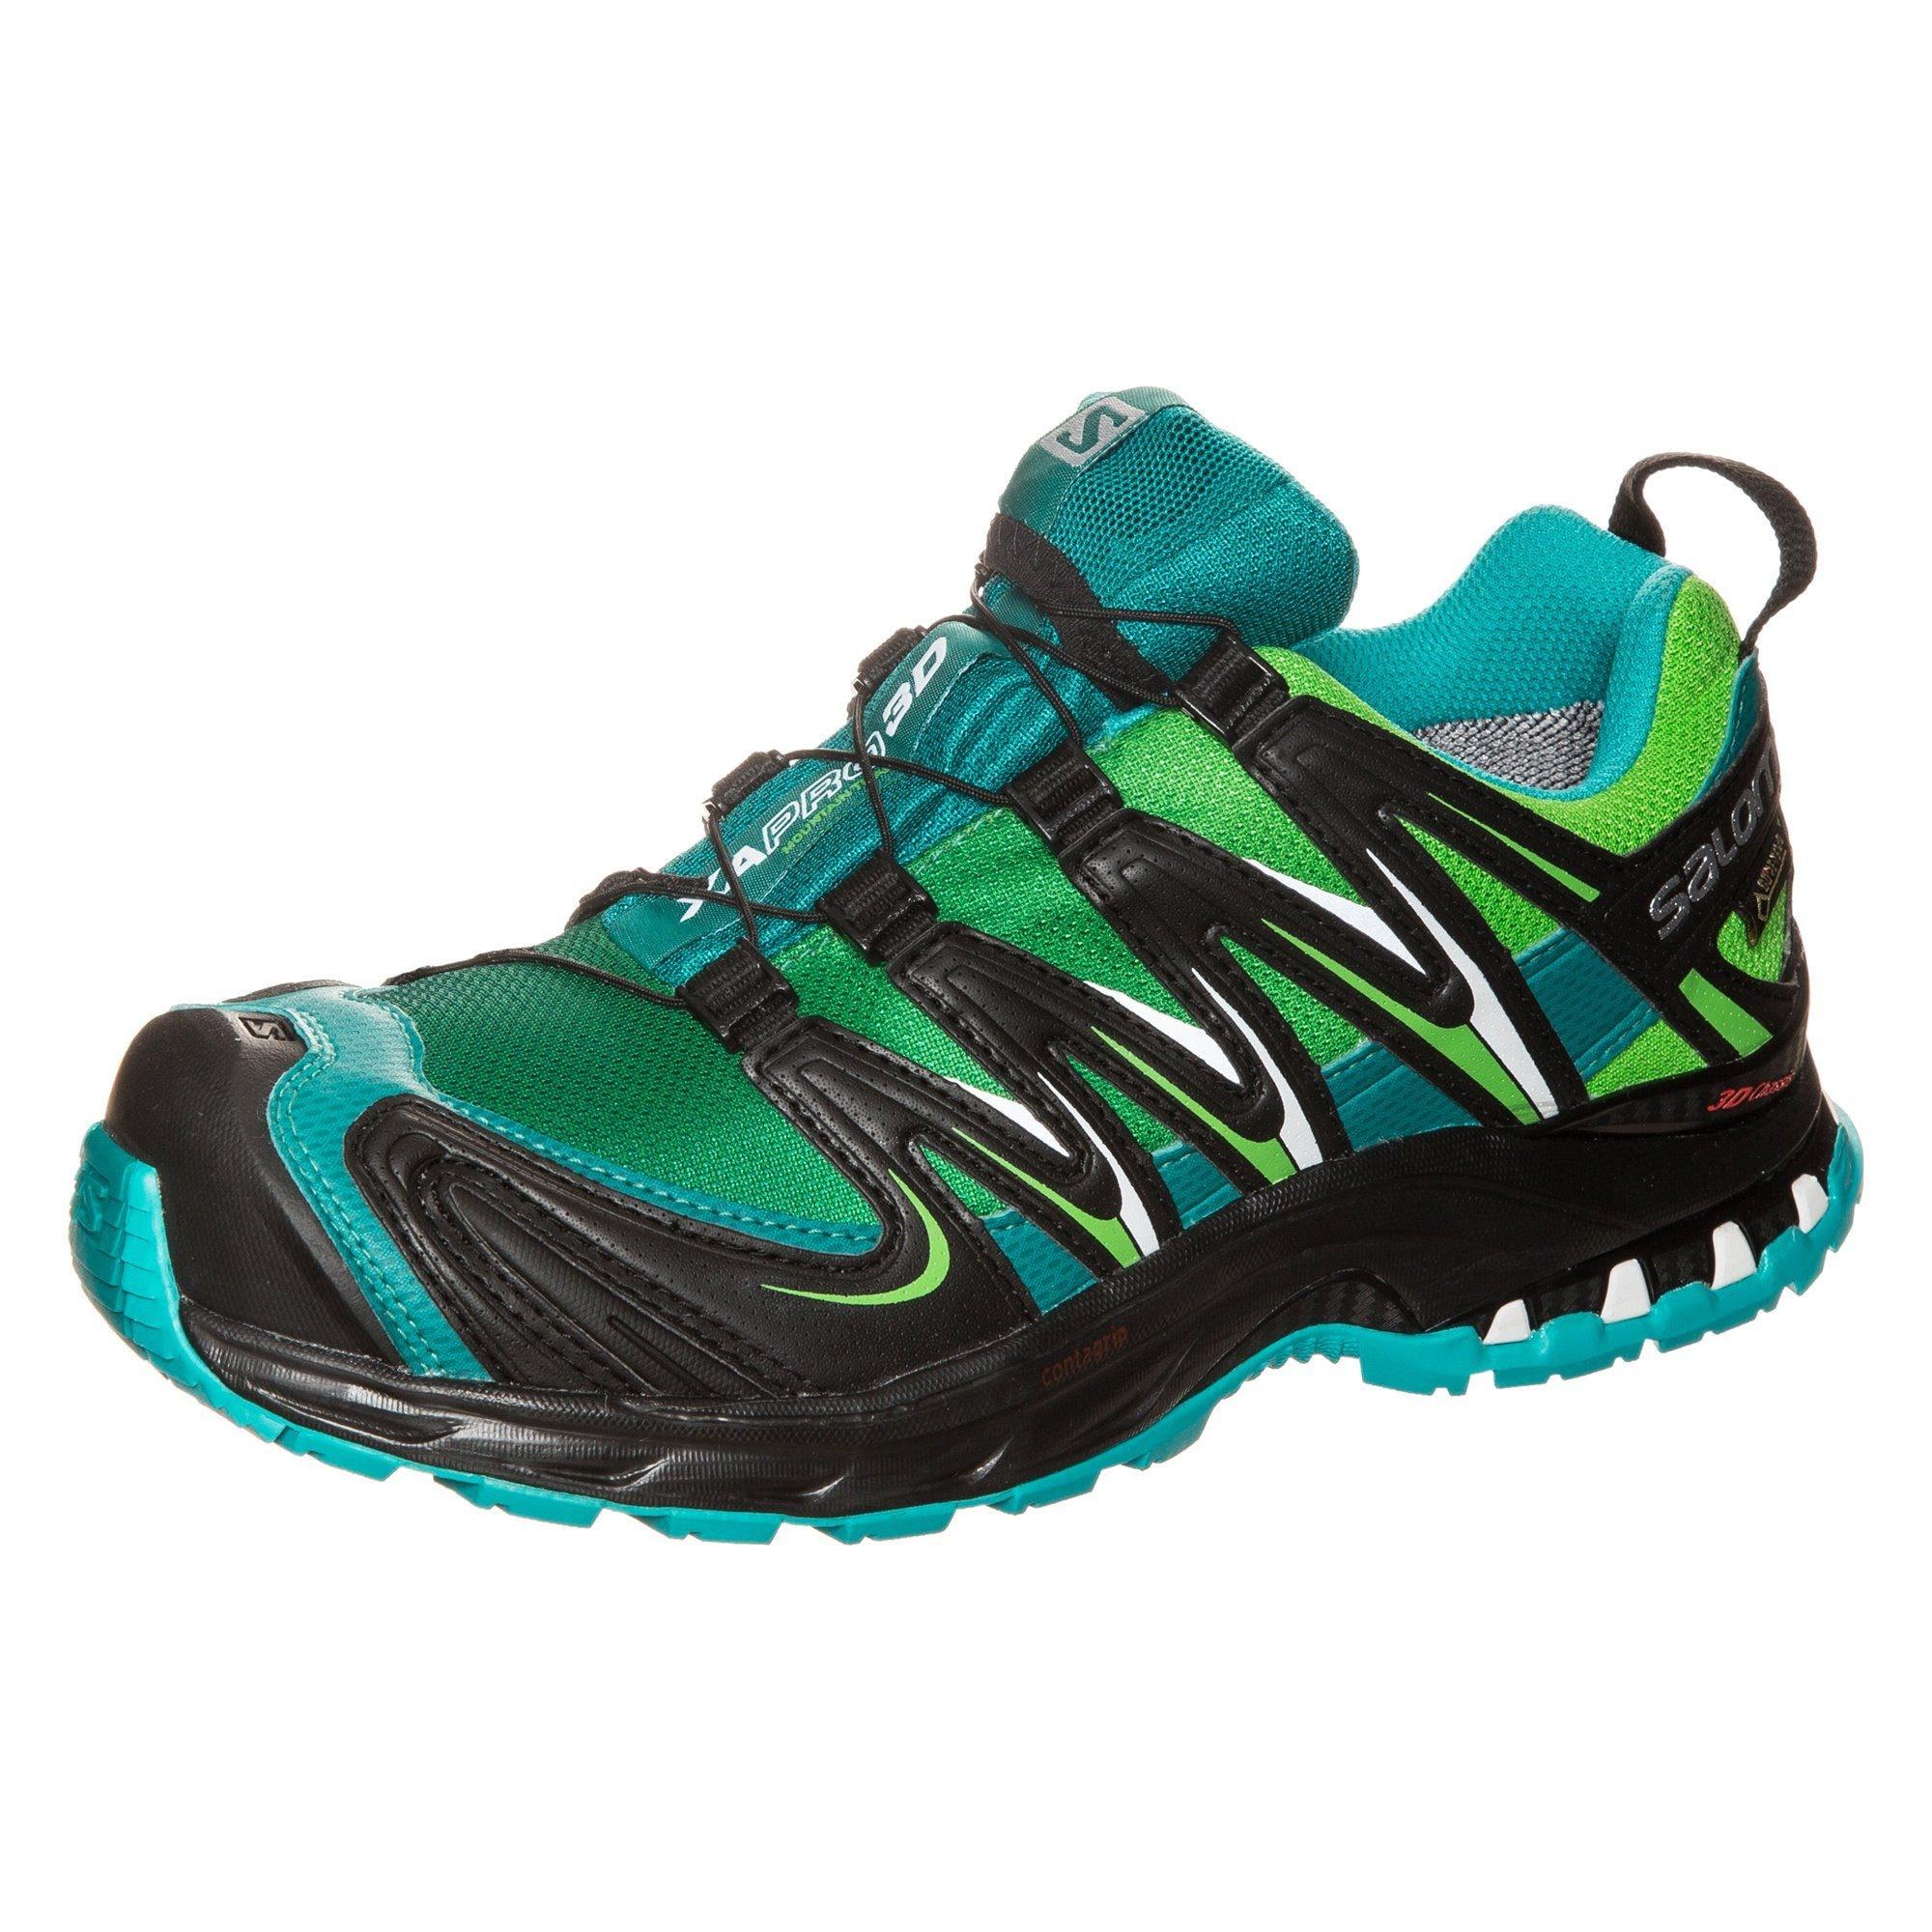 Salomon XA PRO 3D Trail Laufschuh Damen Damen Schuhe rot